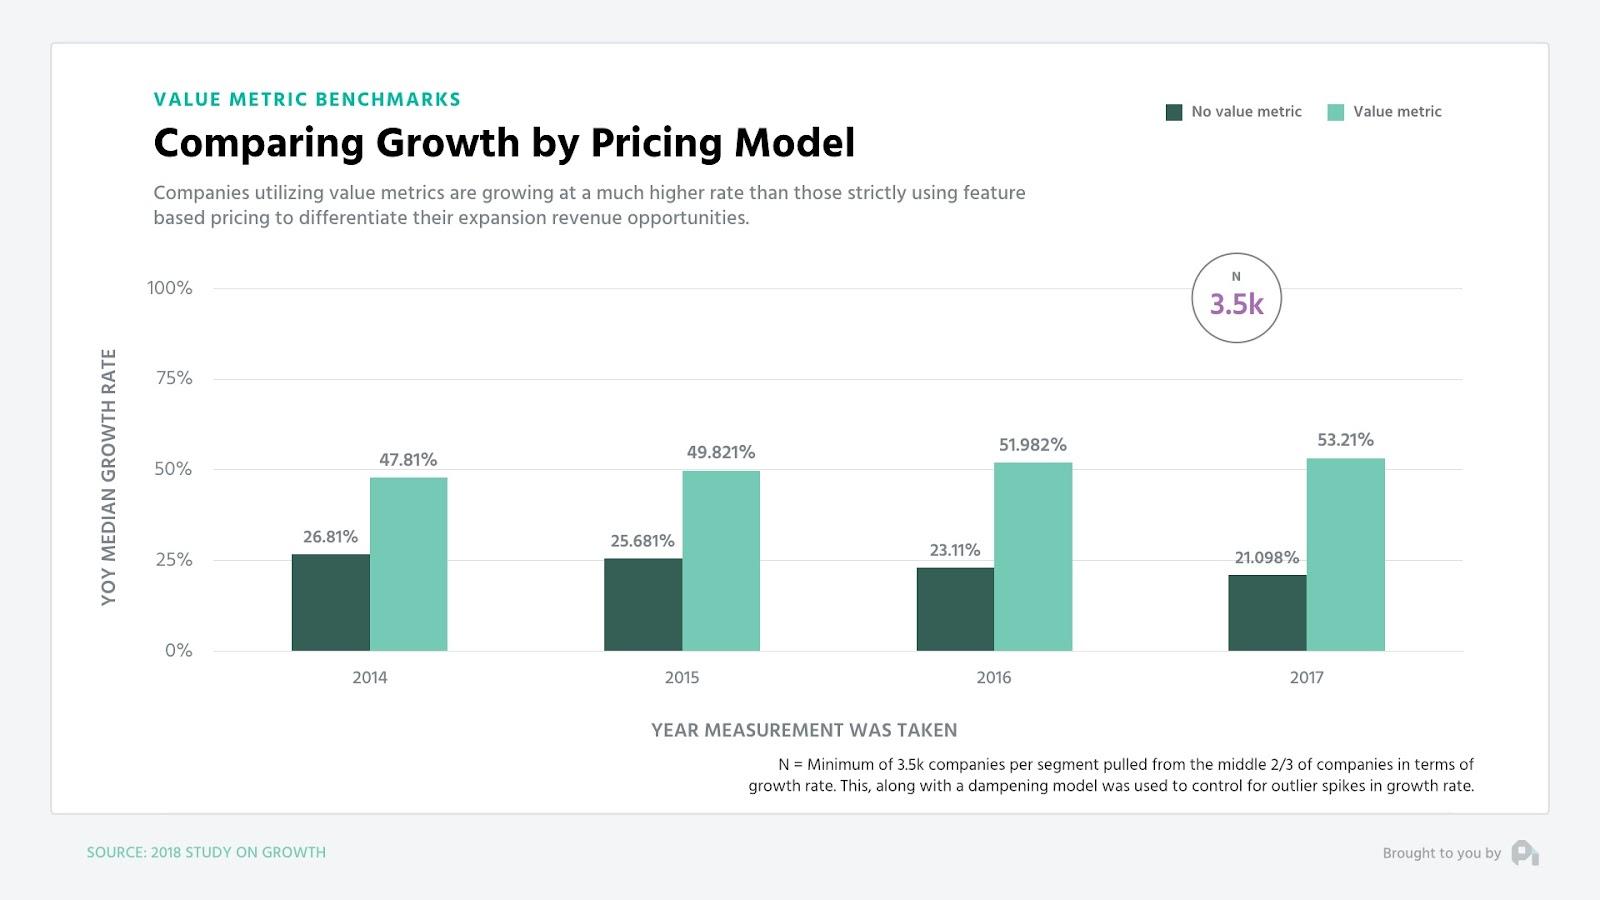 Value metrics